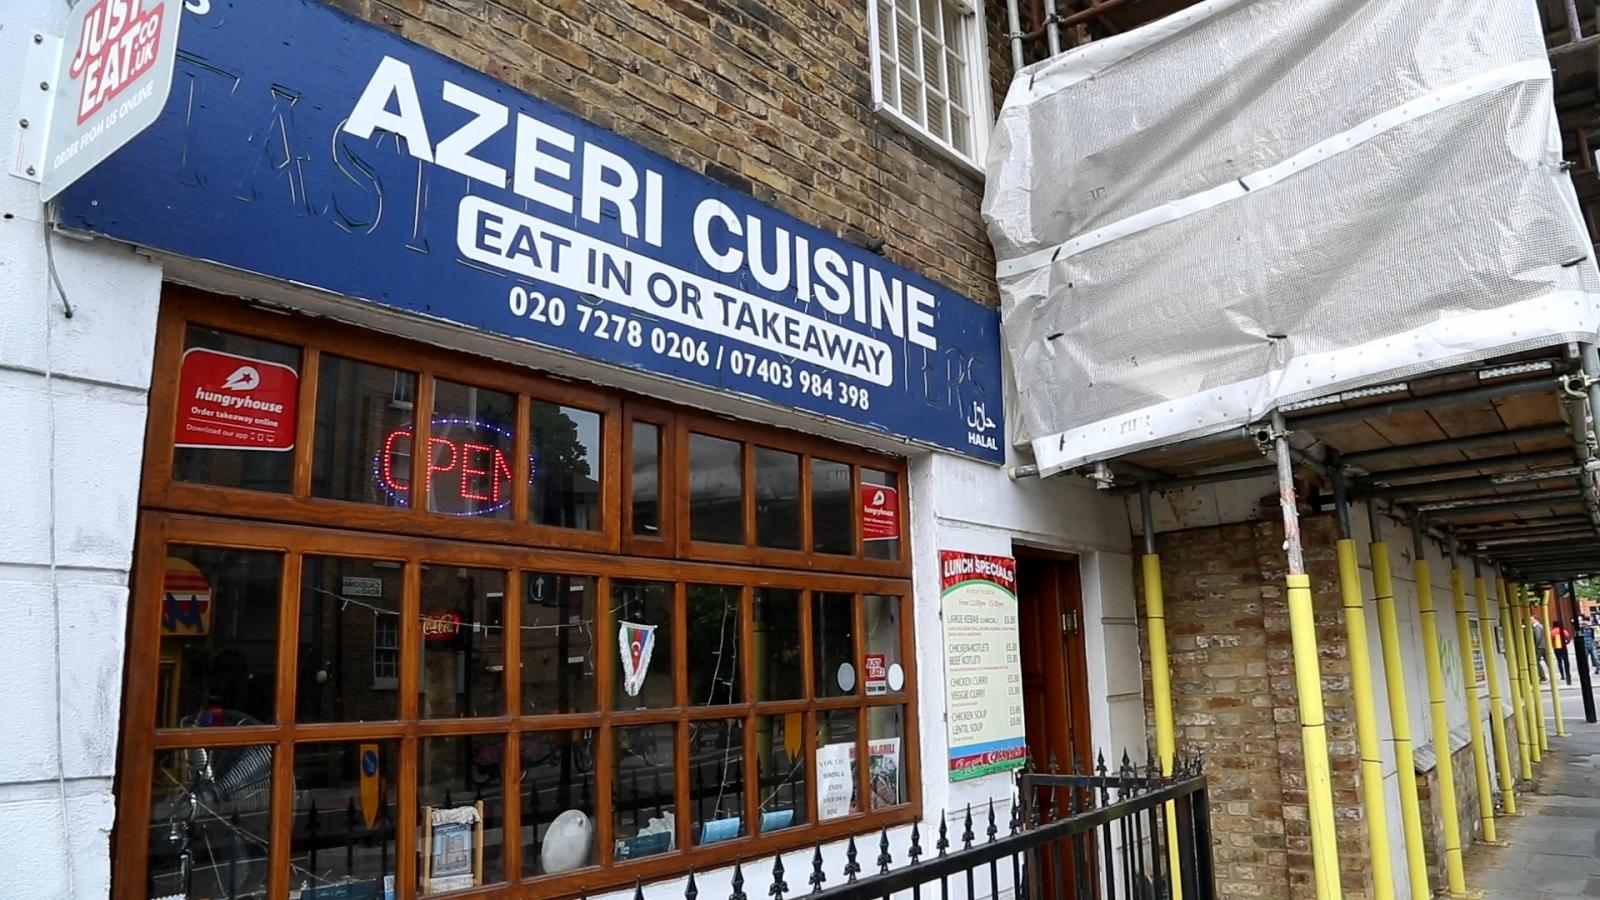 Azeri Cuisine Caledonian Road London